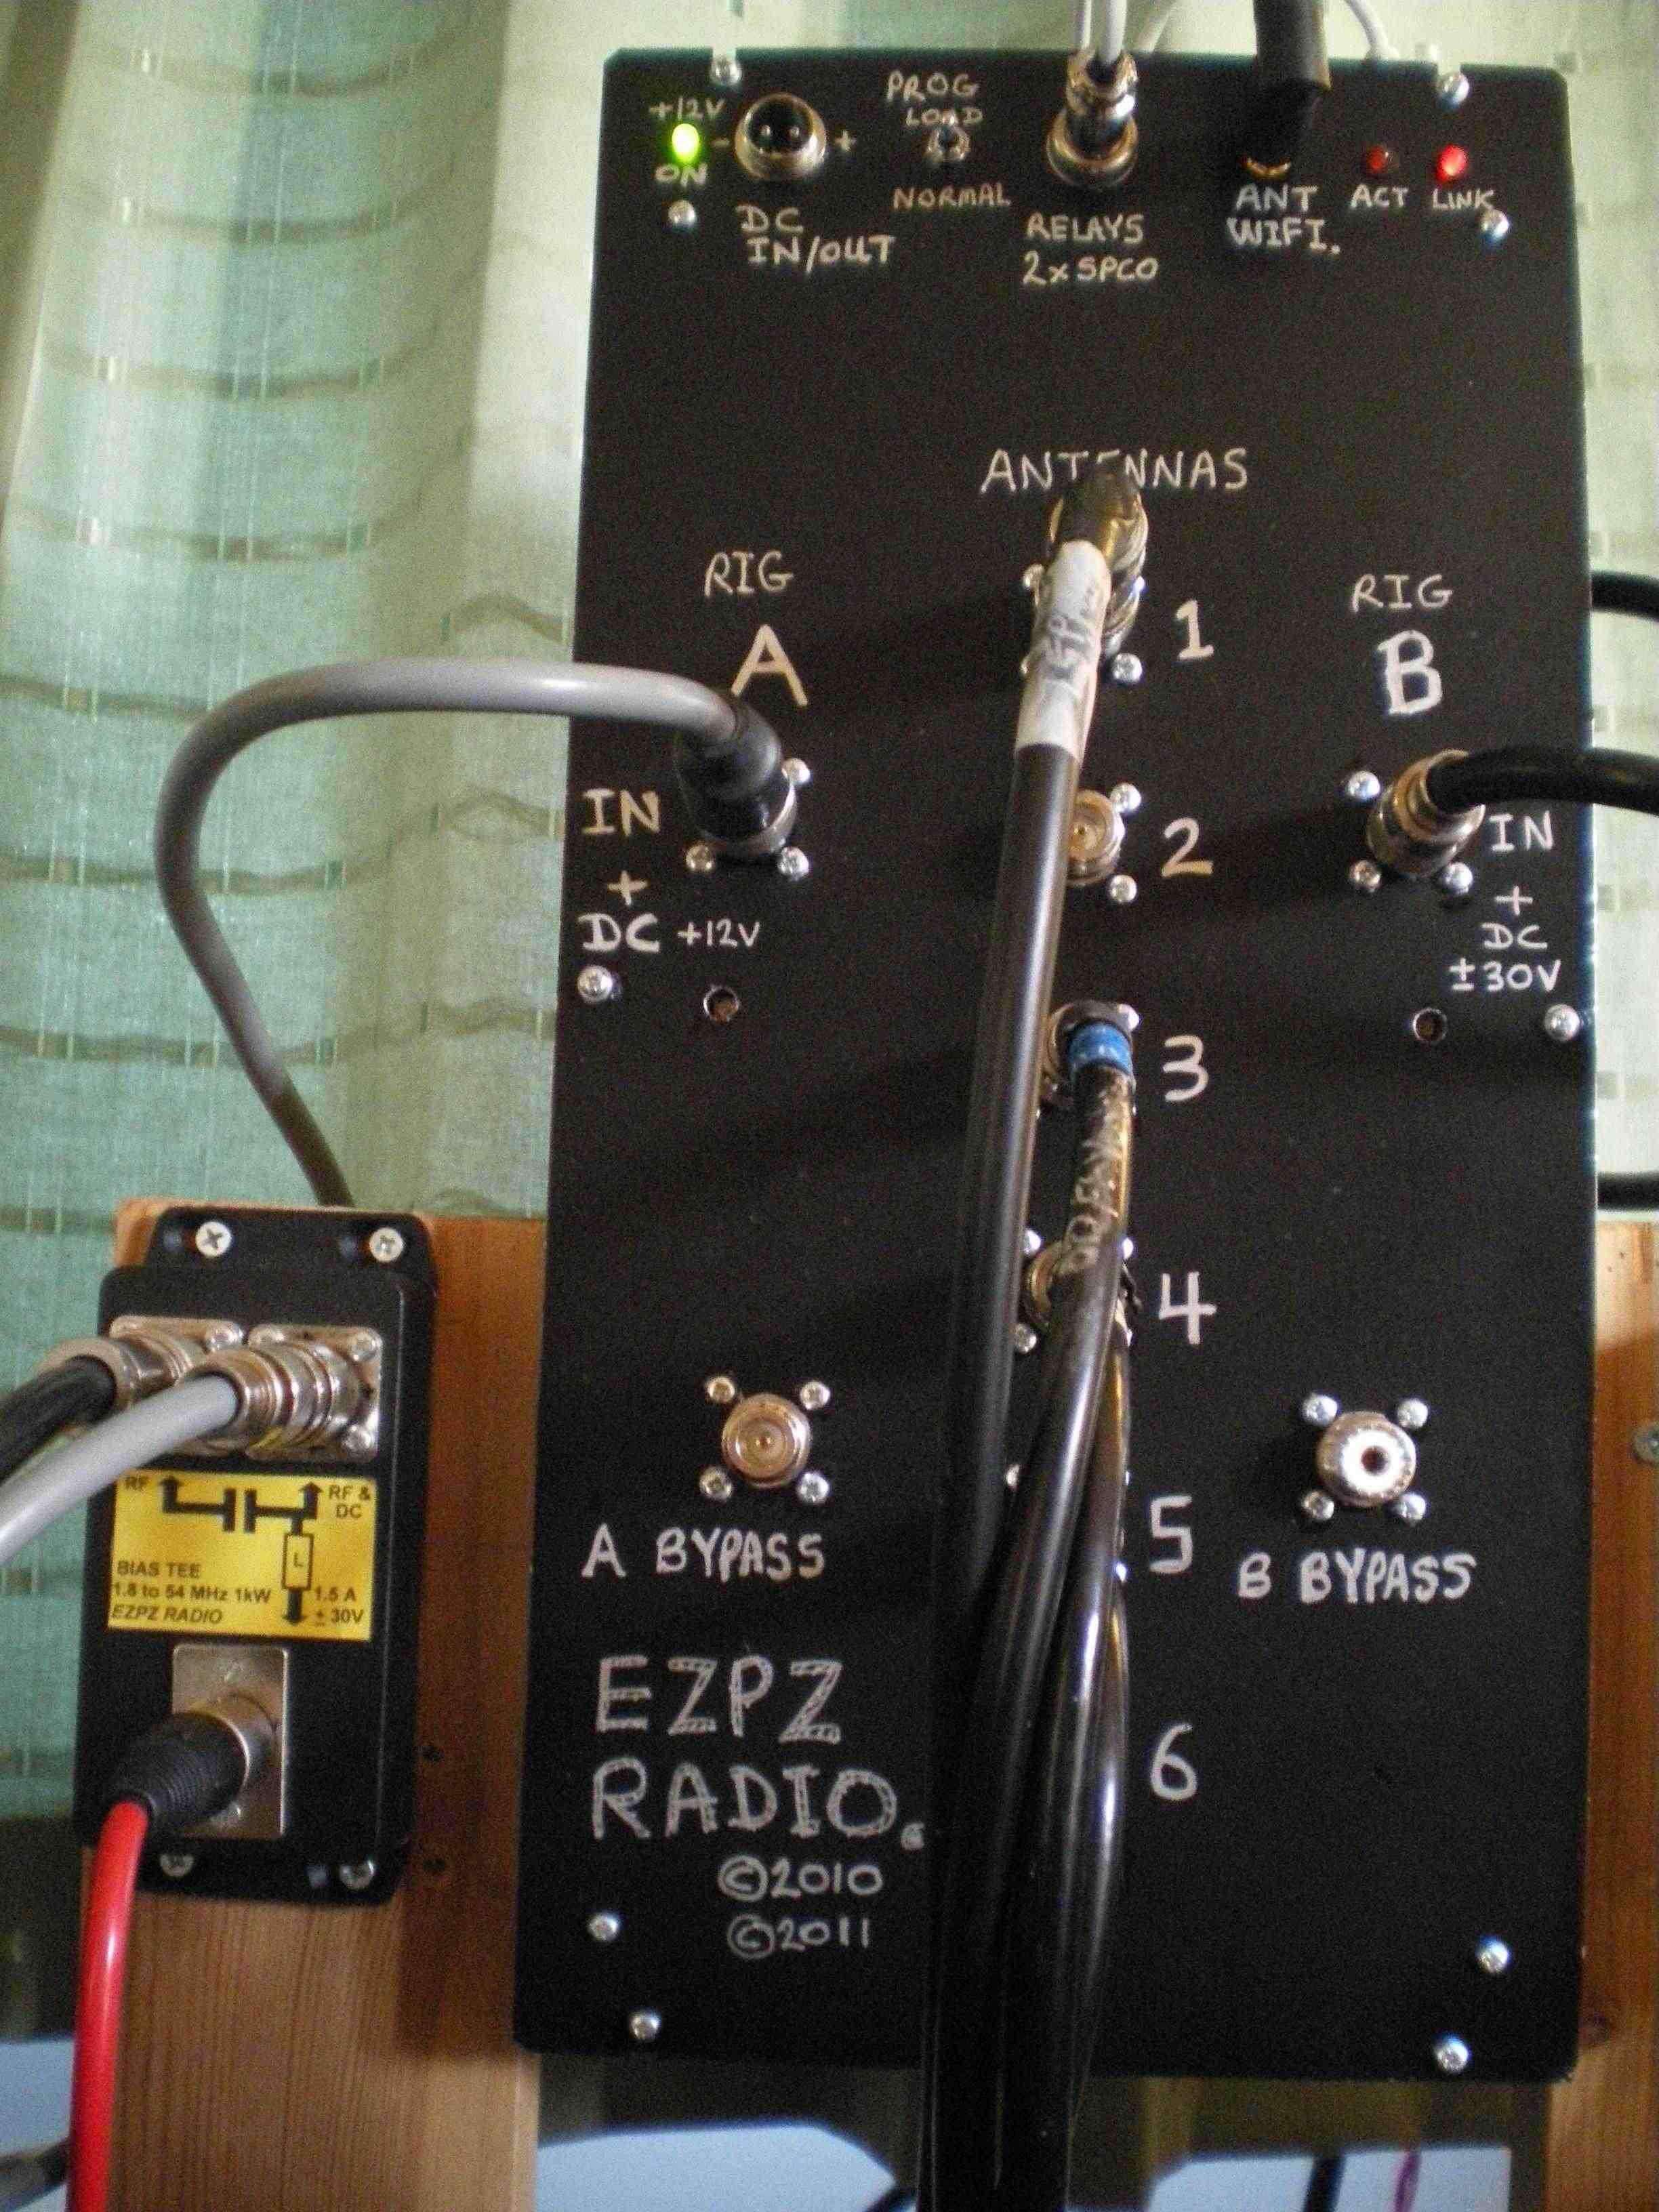 Wifi Remote 6 antennas x 2 radio, Antenna Switch